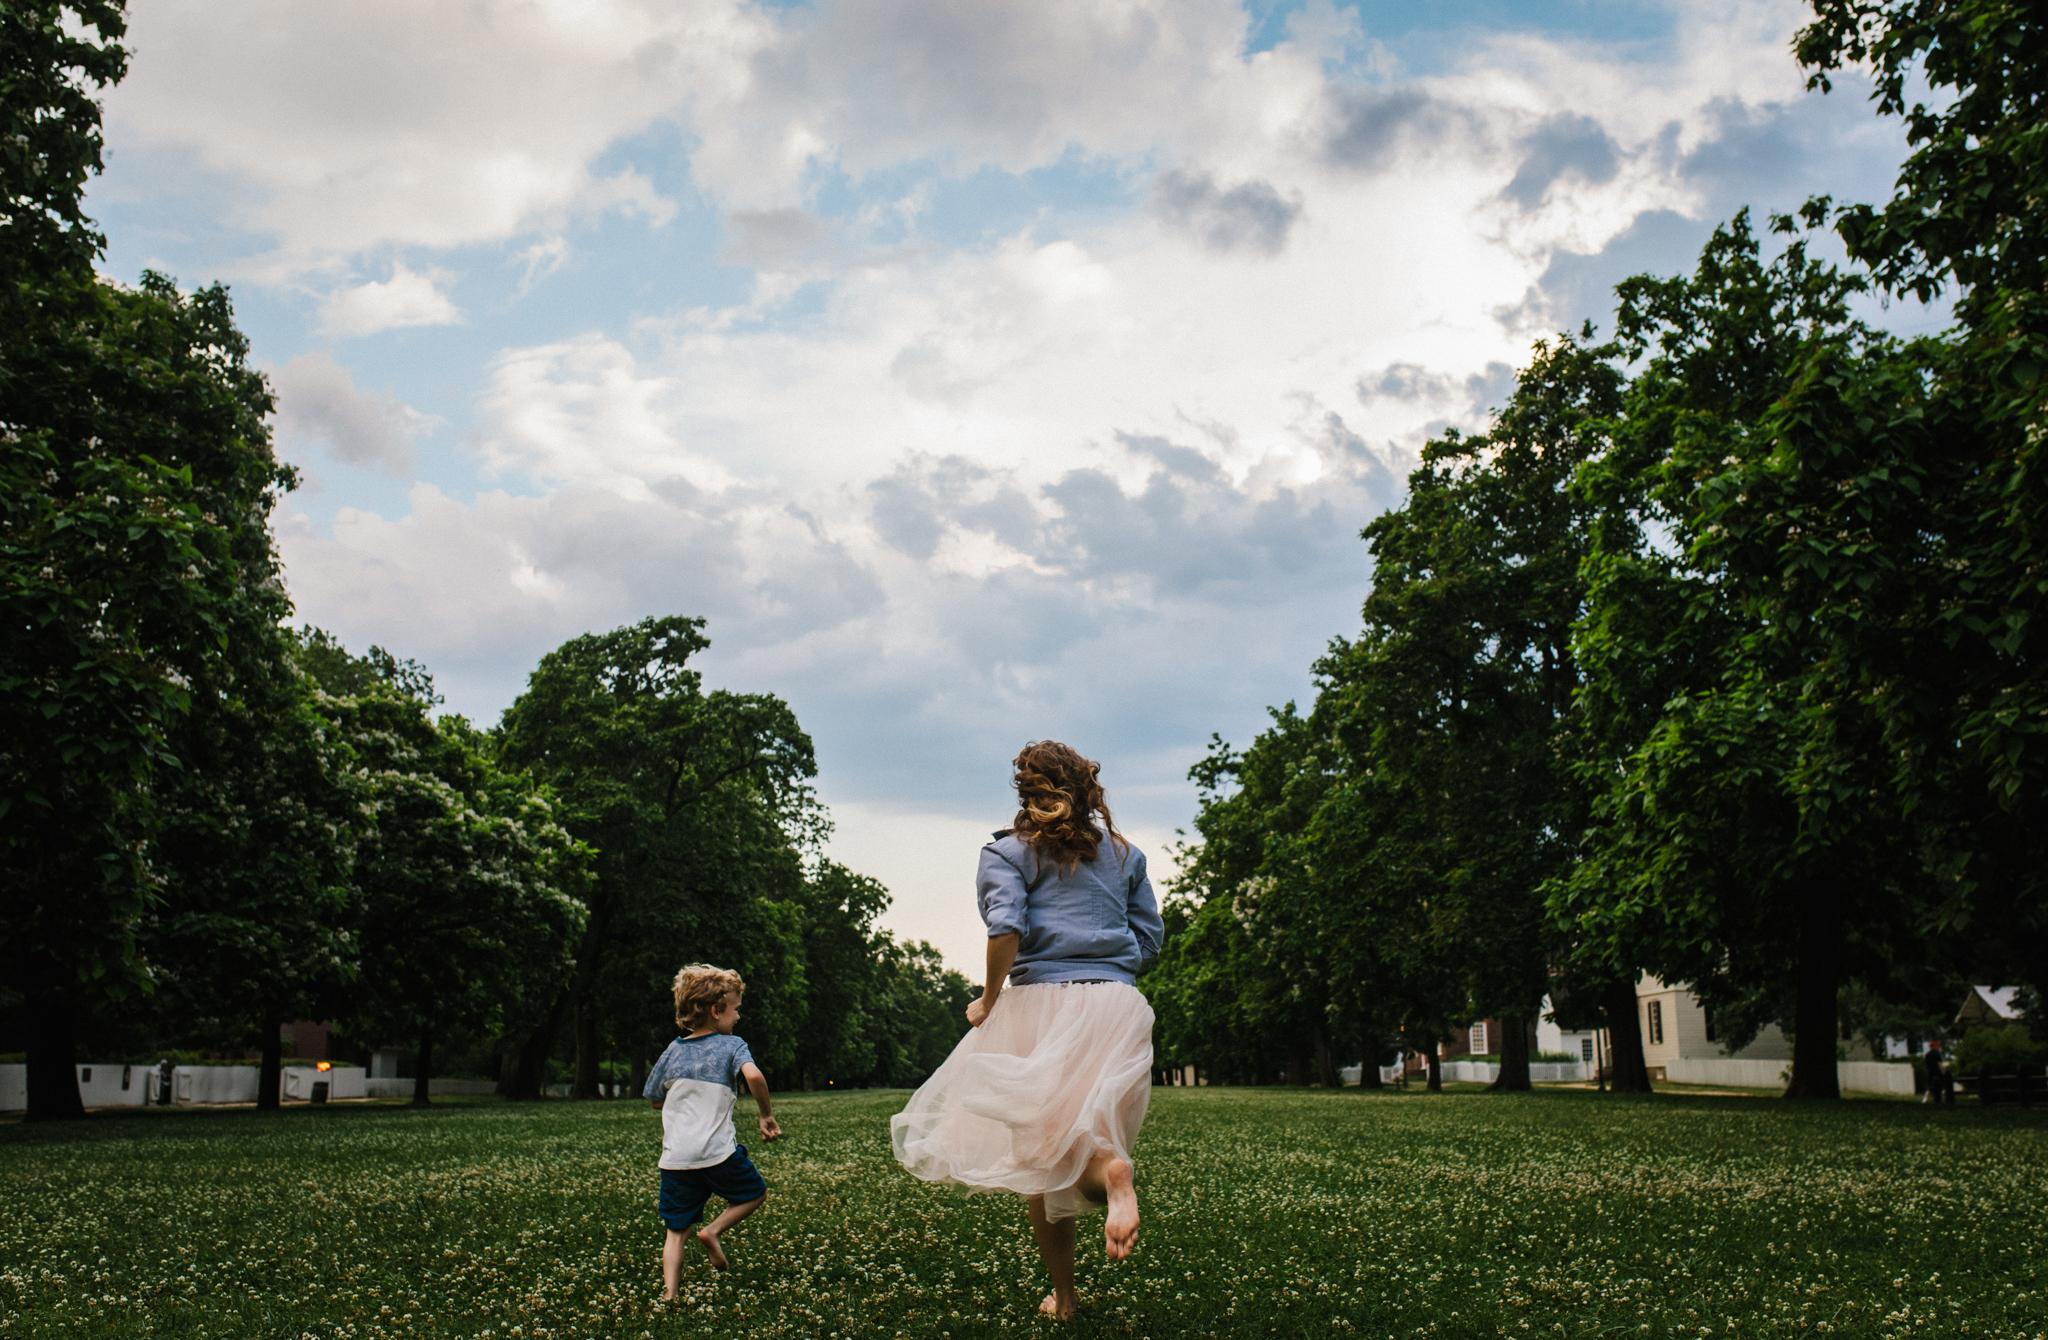 Nicoleandjack_colonialwilliamsburg_mommyandme_meadowsfrozencustard-61.jpg